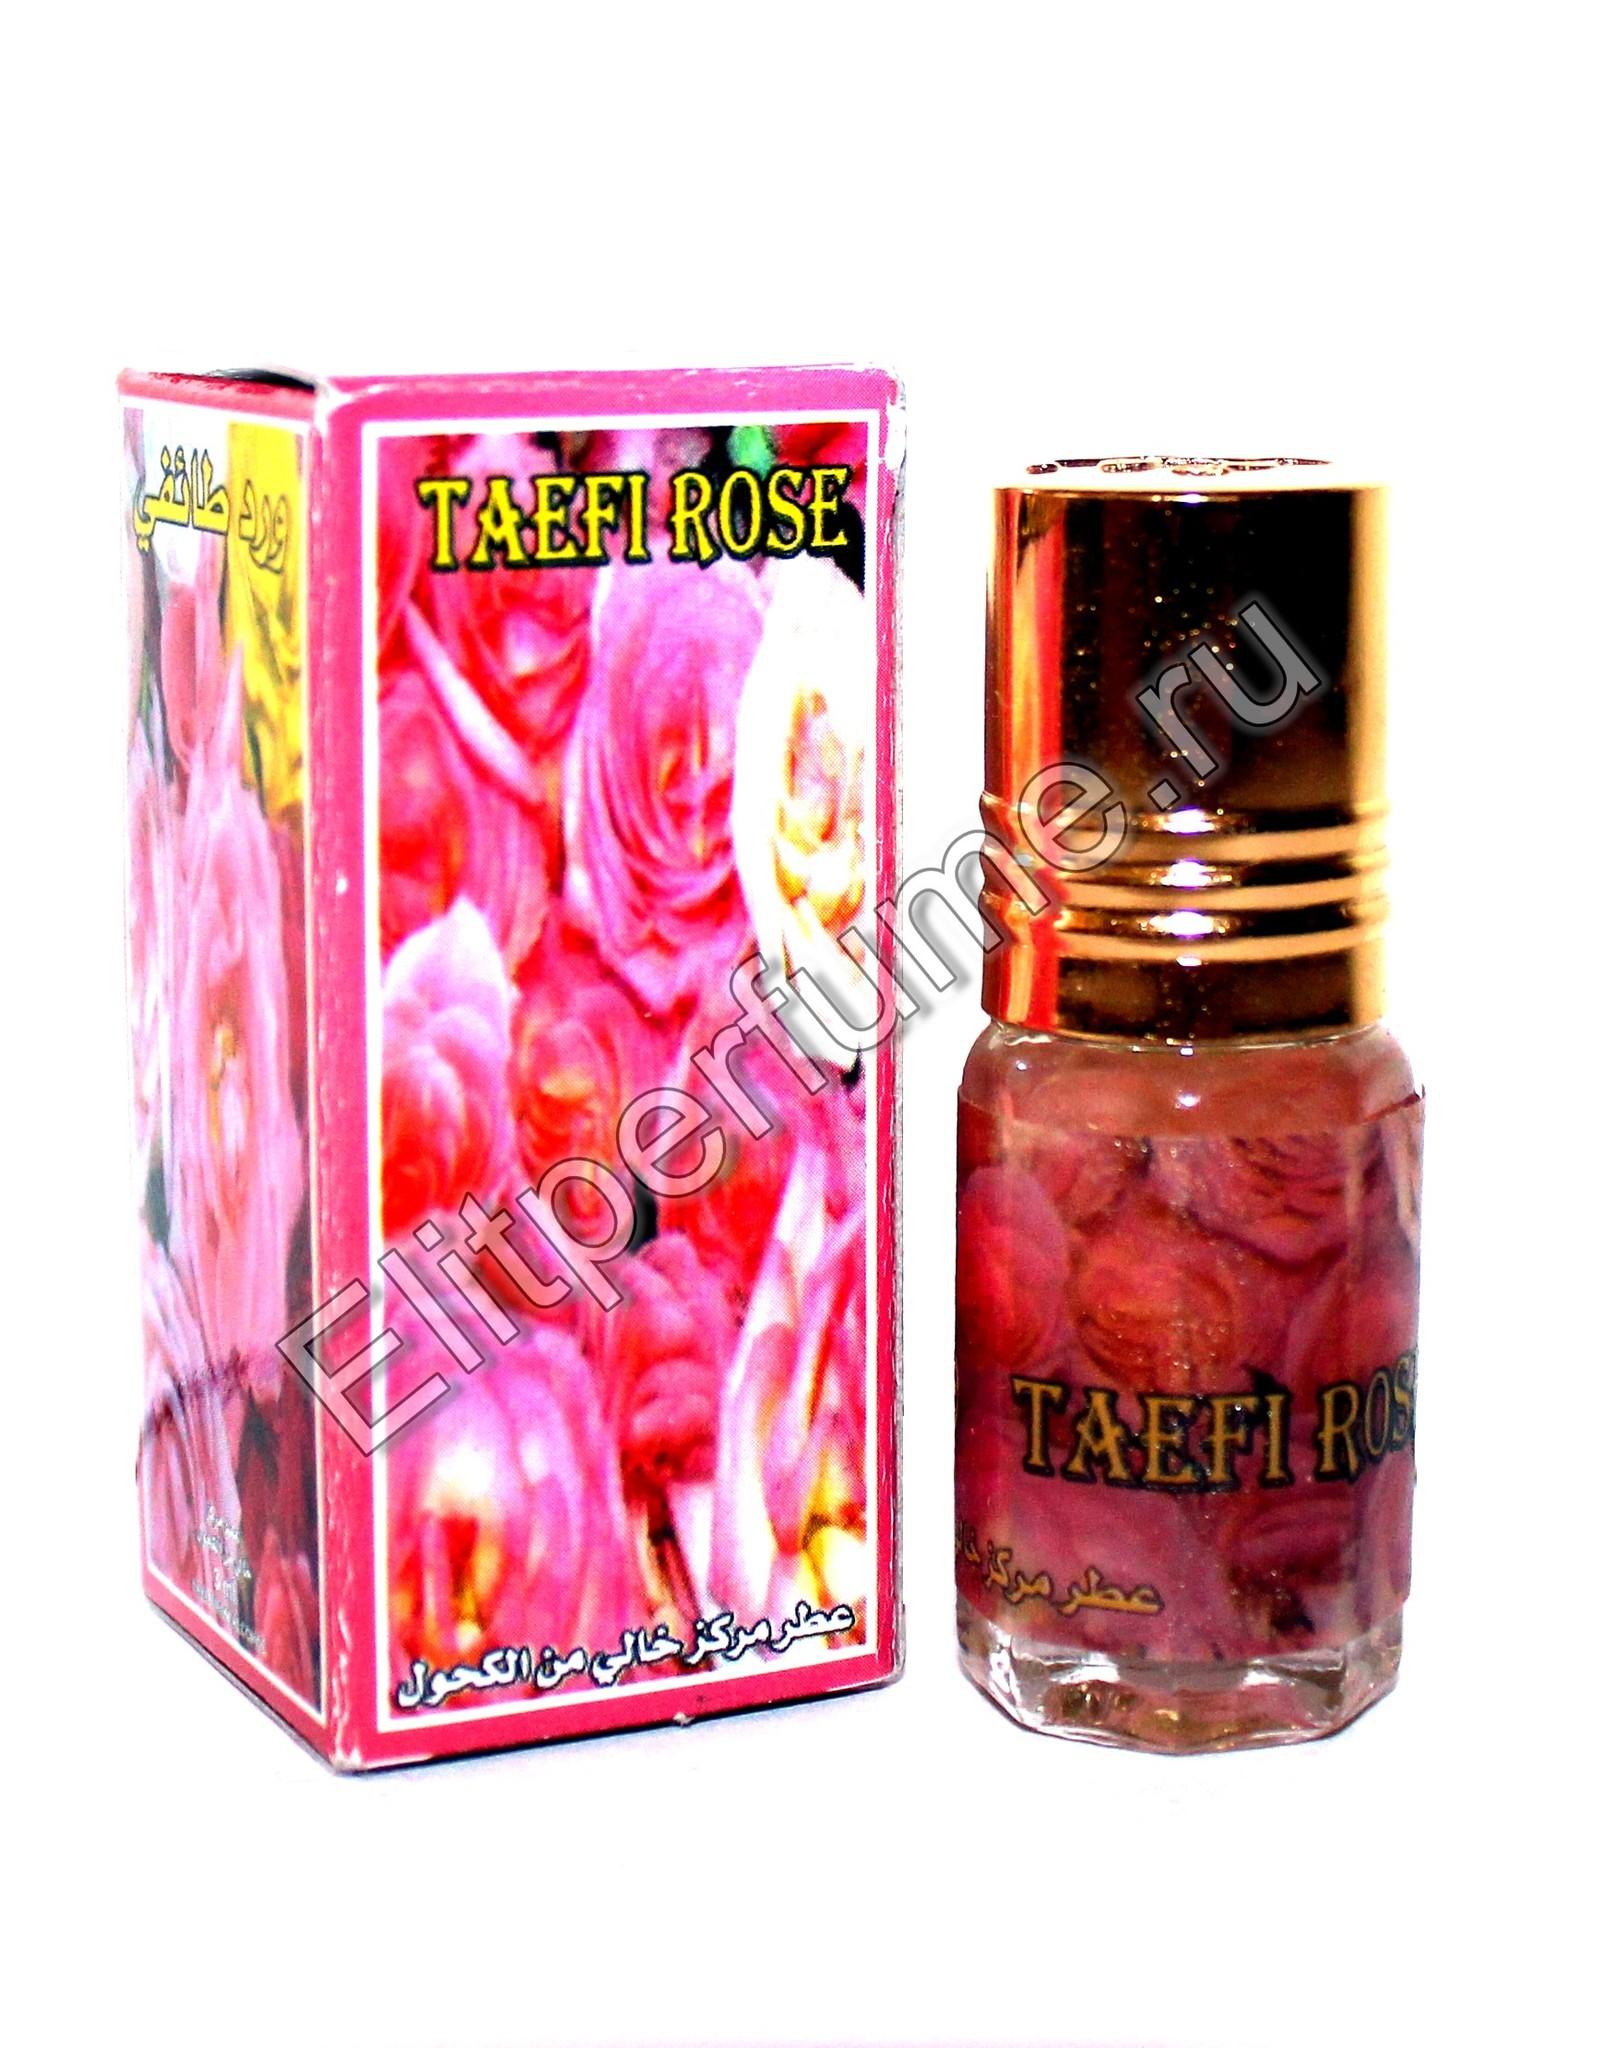 Taefi Rose Роза Таифи 3 мл арабские масляные духи от Захра Zahra Perfumes